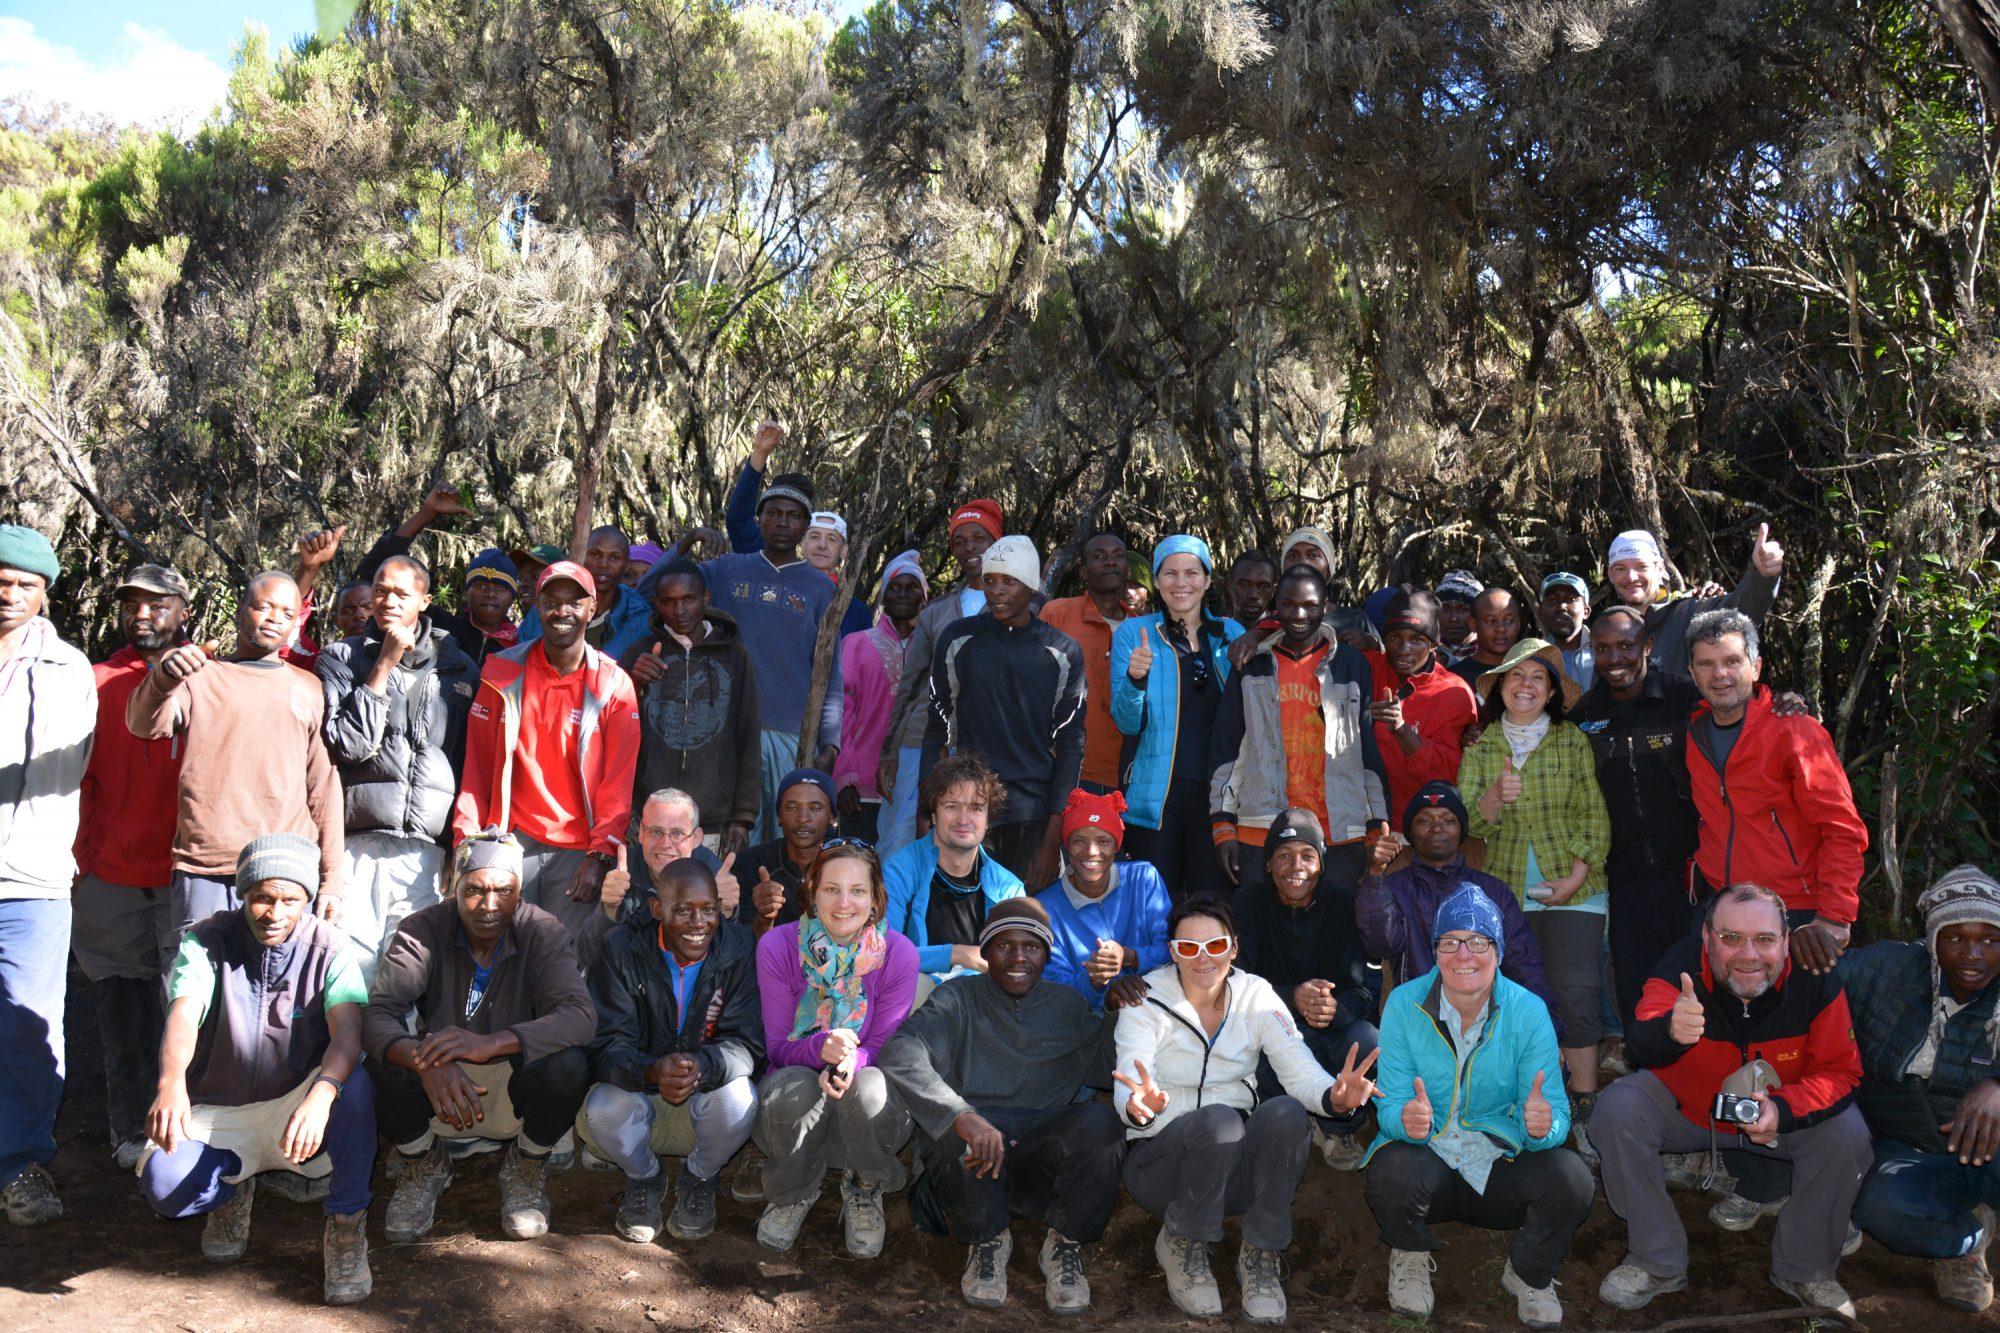 Gruppenfoto, Kilimandscharo, Kilimandscharo besteigen, Tansania, Afrika, Kilimandscharo Tour, Erfahrungsbericht, Machame Route